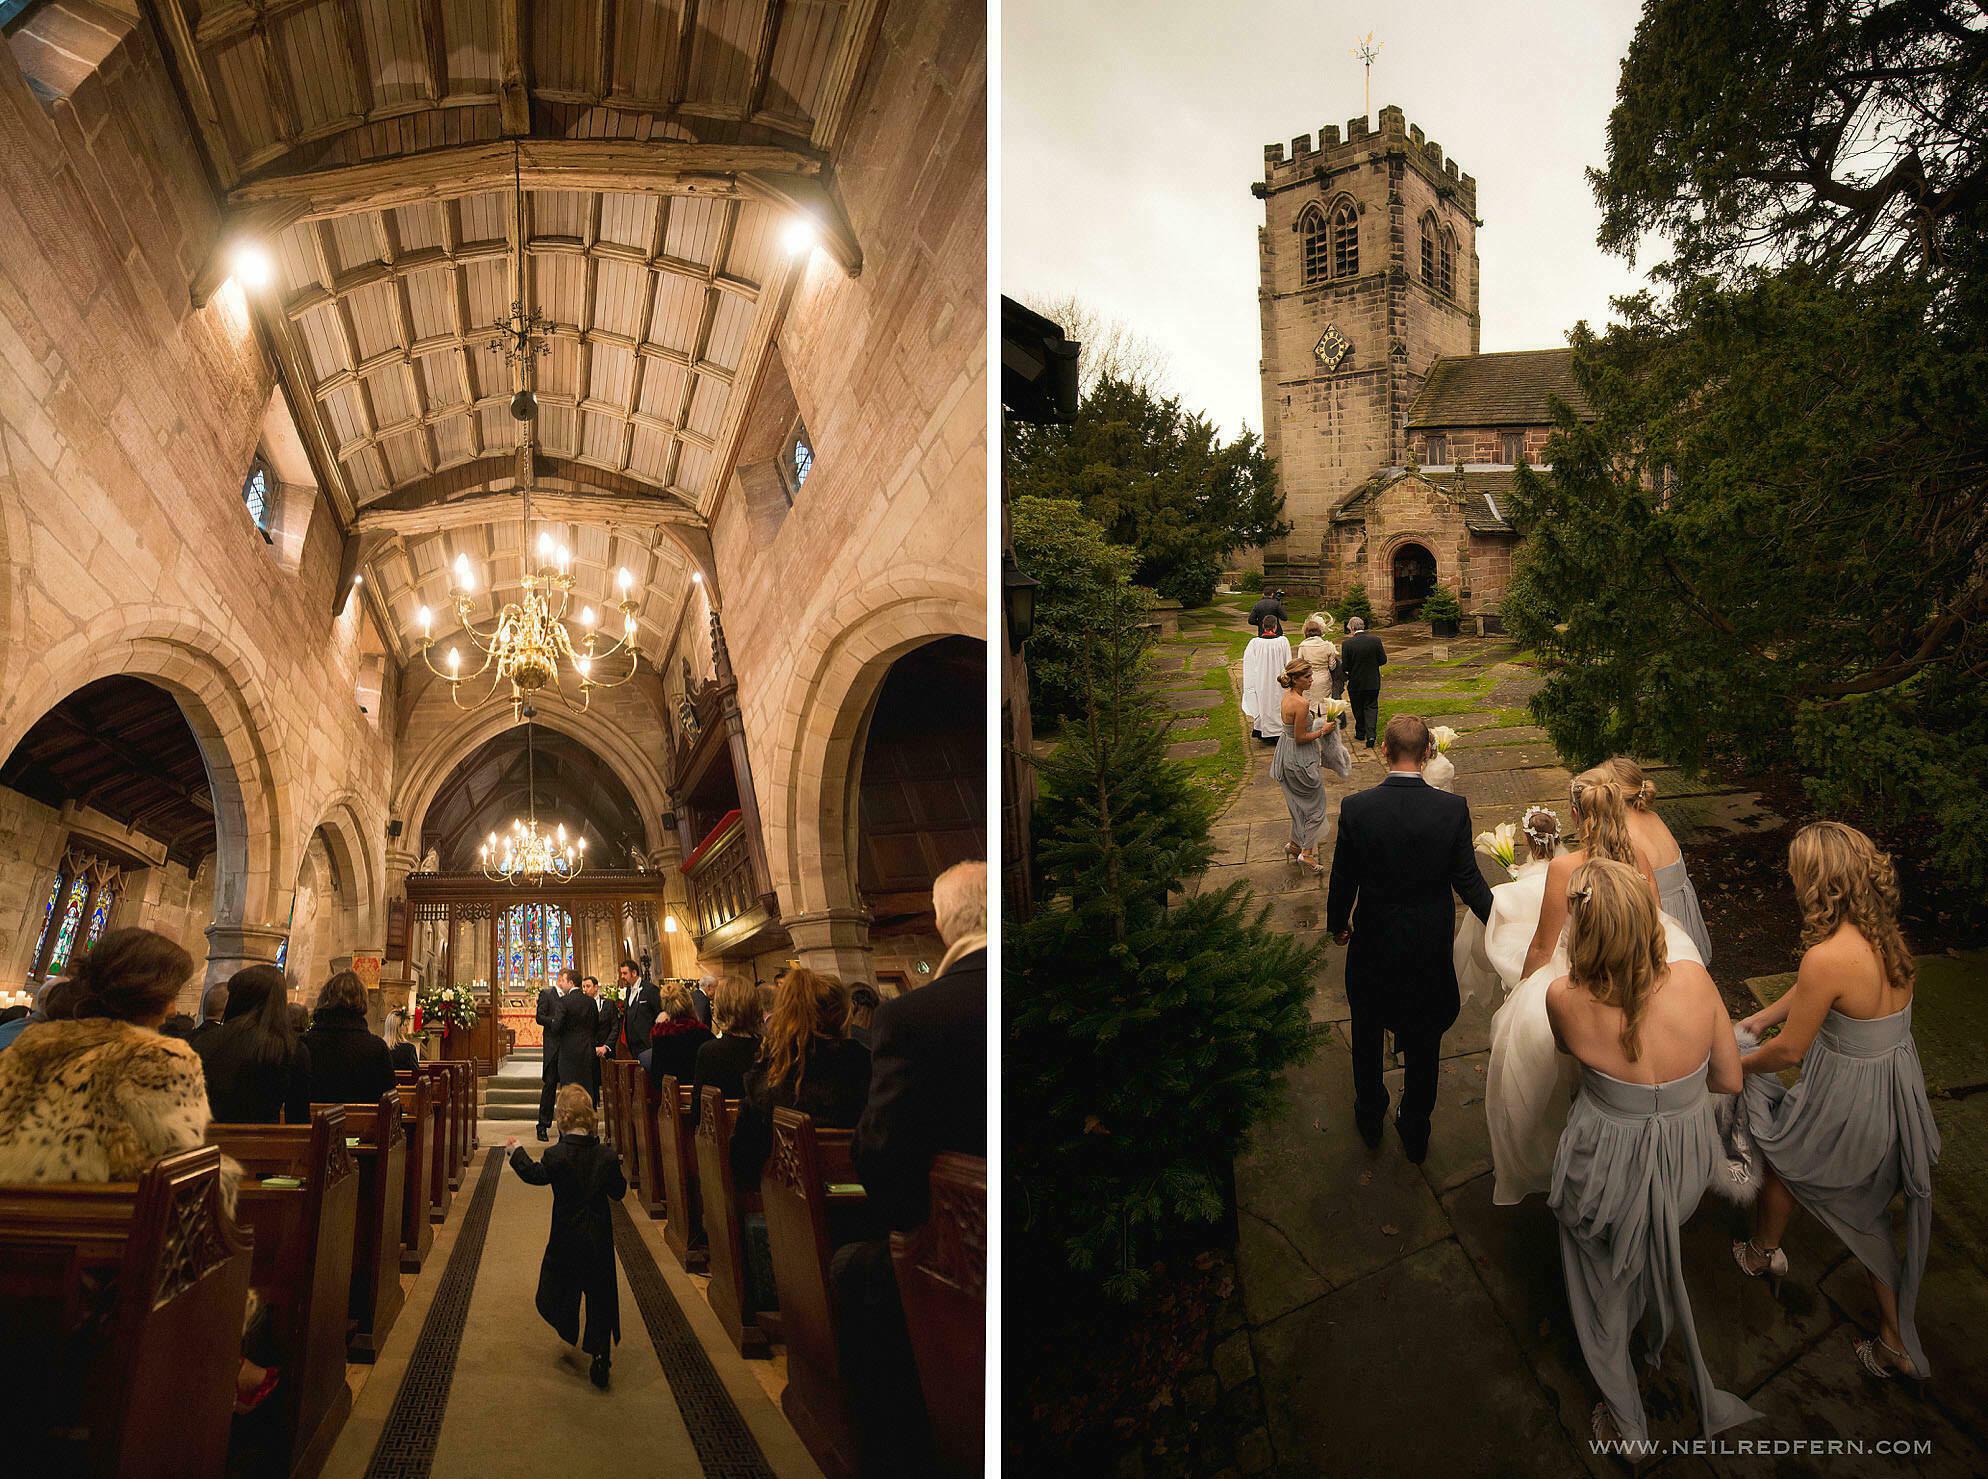 St Mary's Church Nether Alderley wedding 01